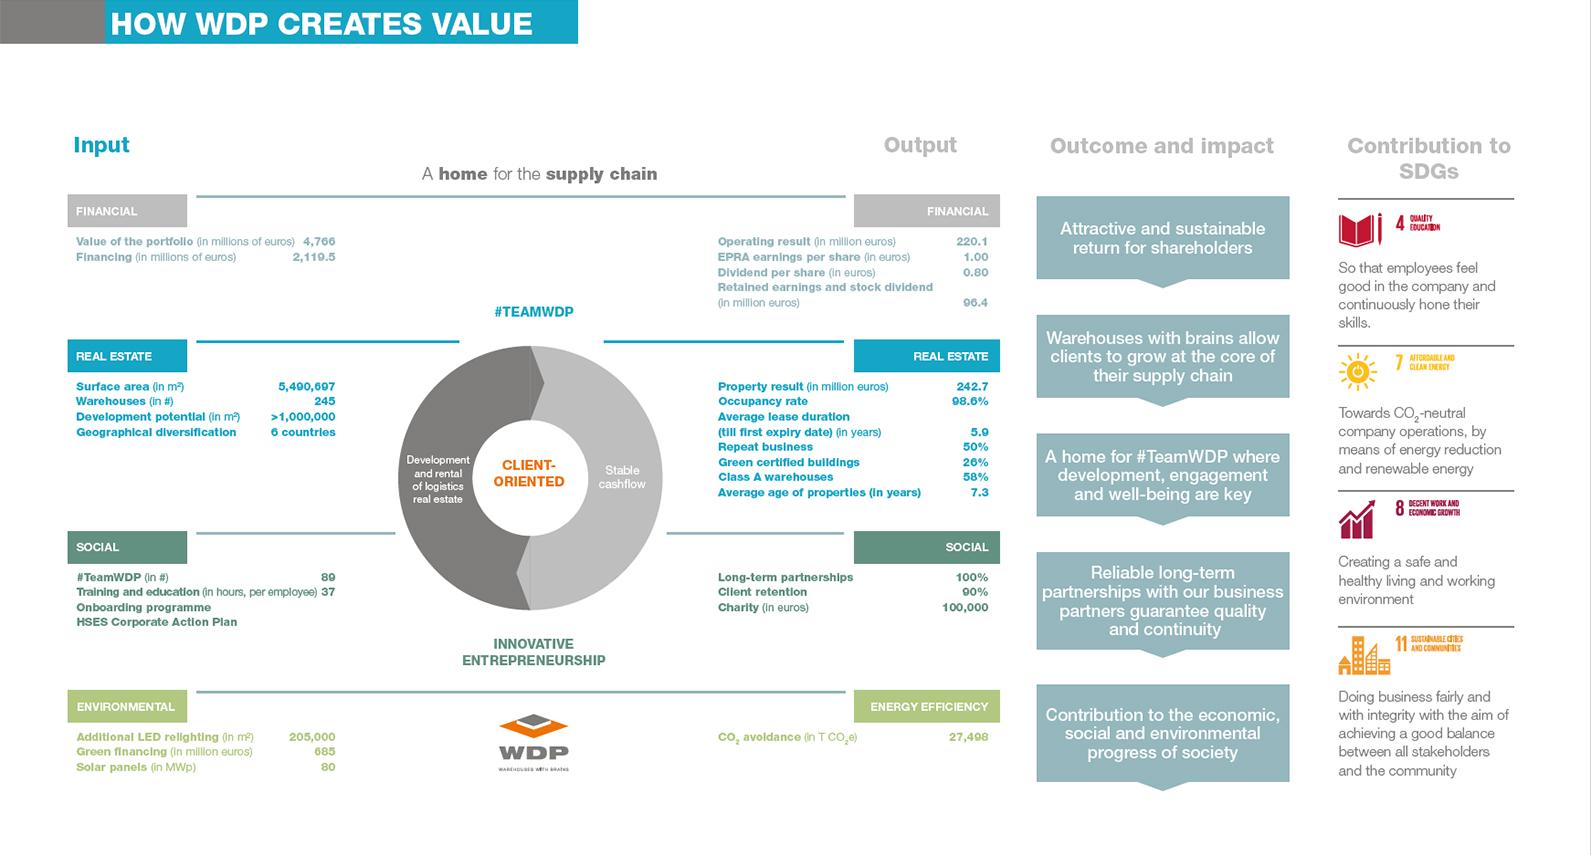 WDP Value creation